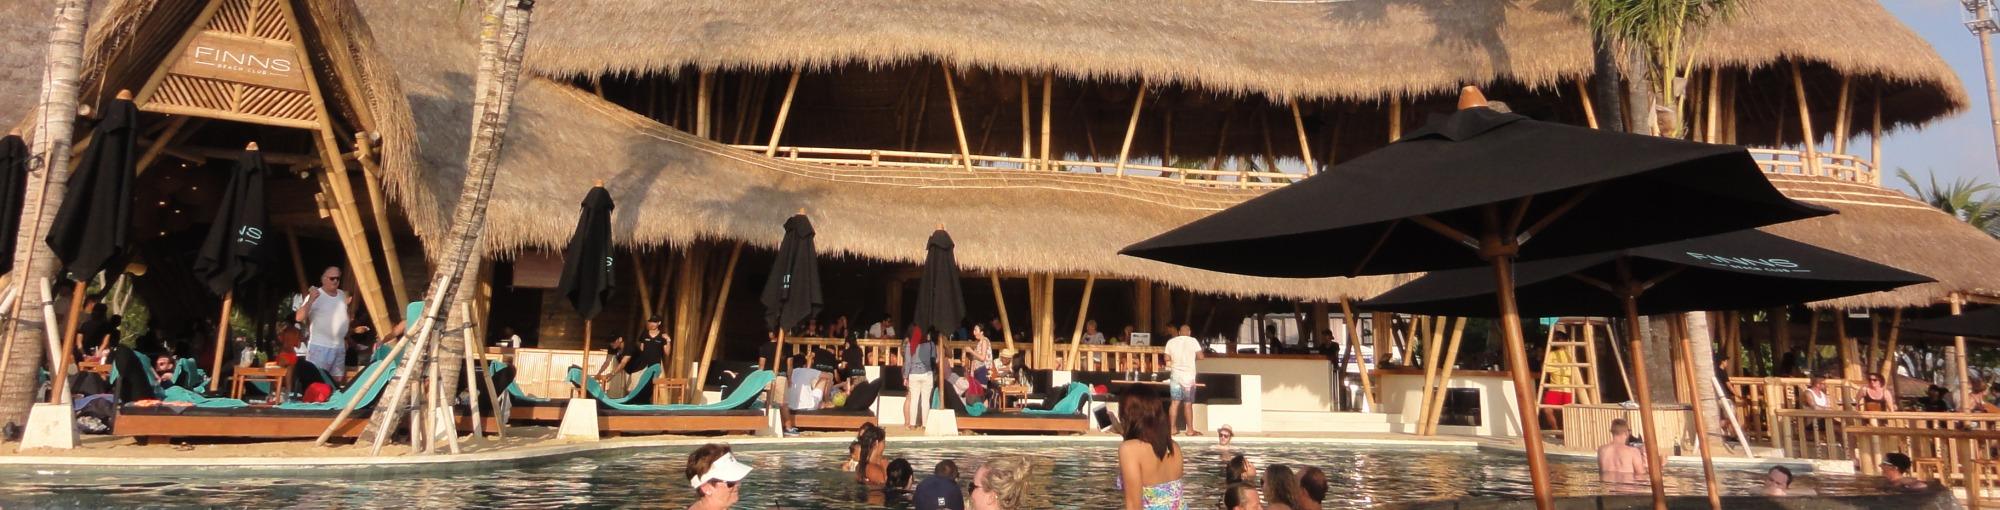 Finns Beach Club Yoma Villas Bali Luxury Private Accommodation